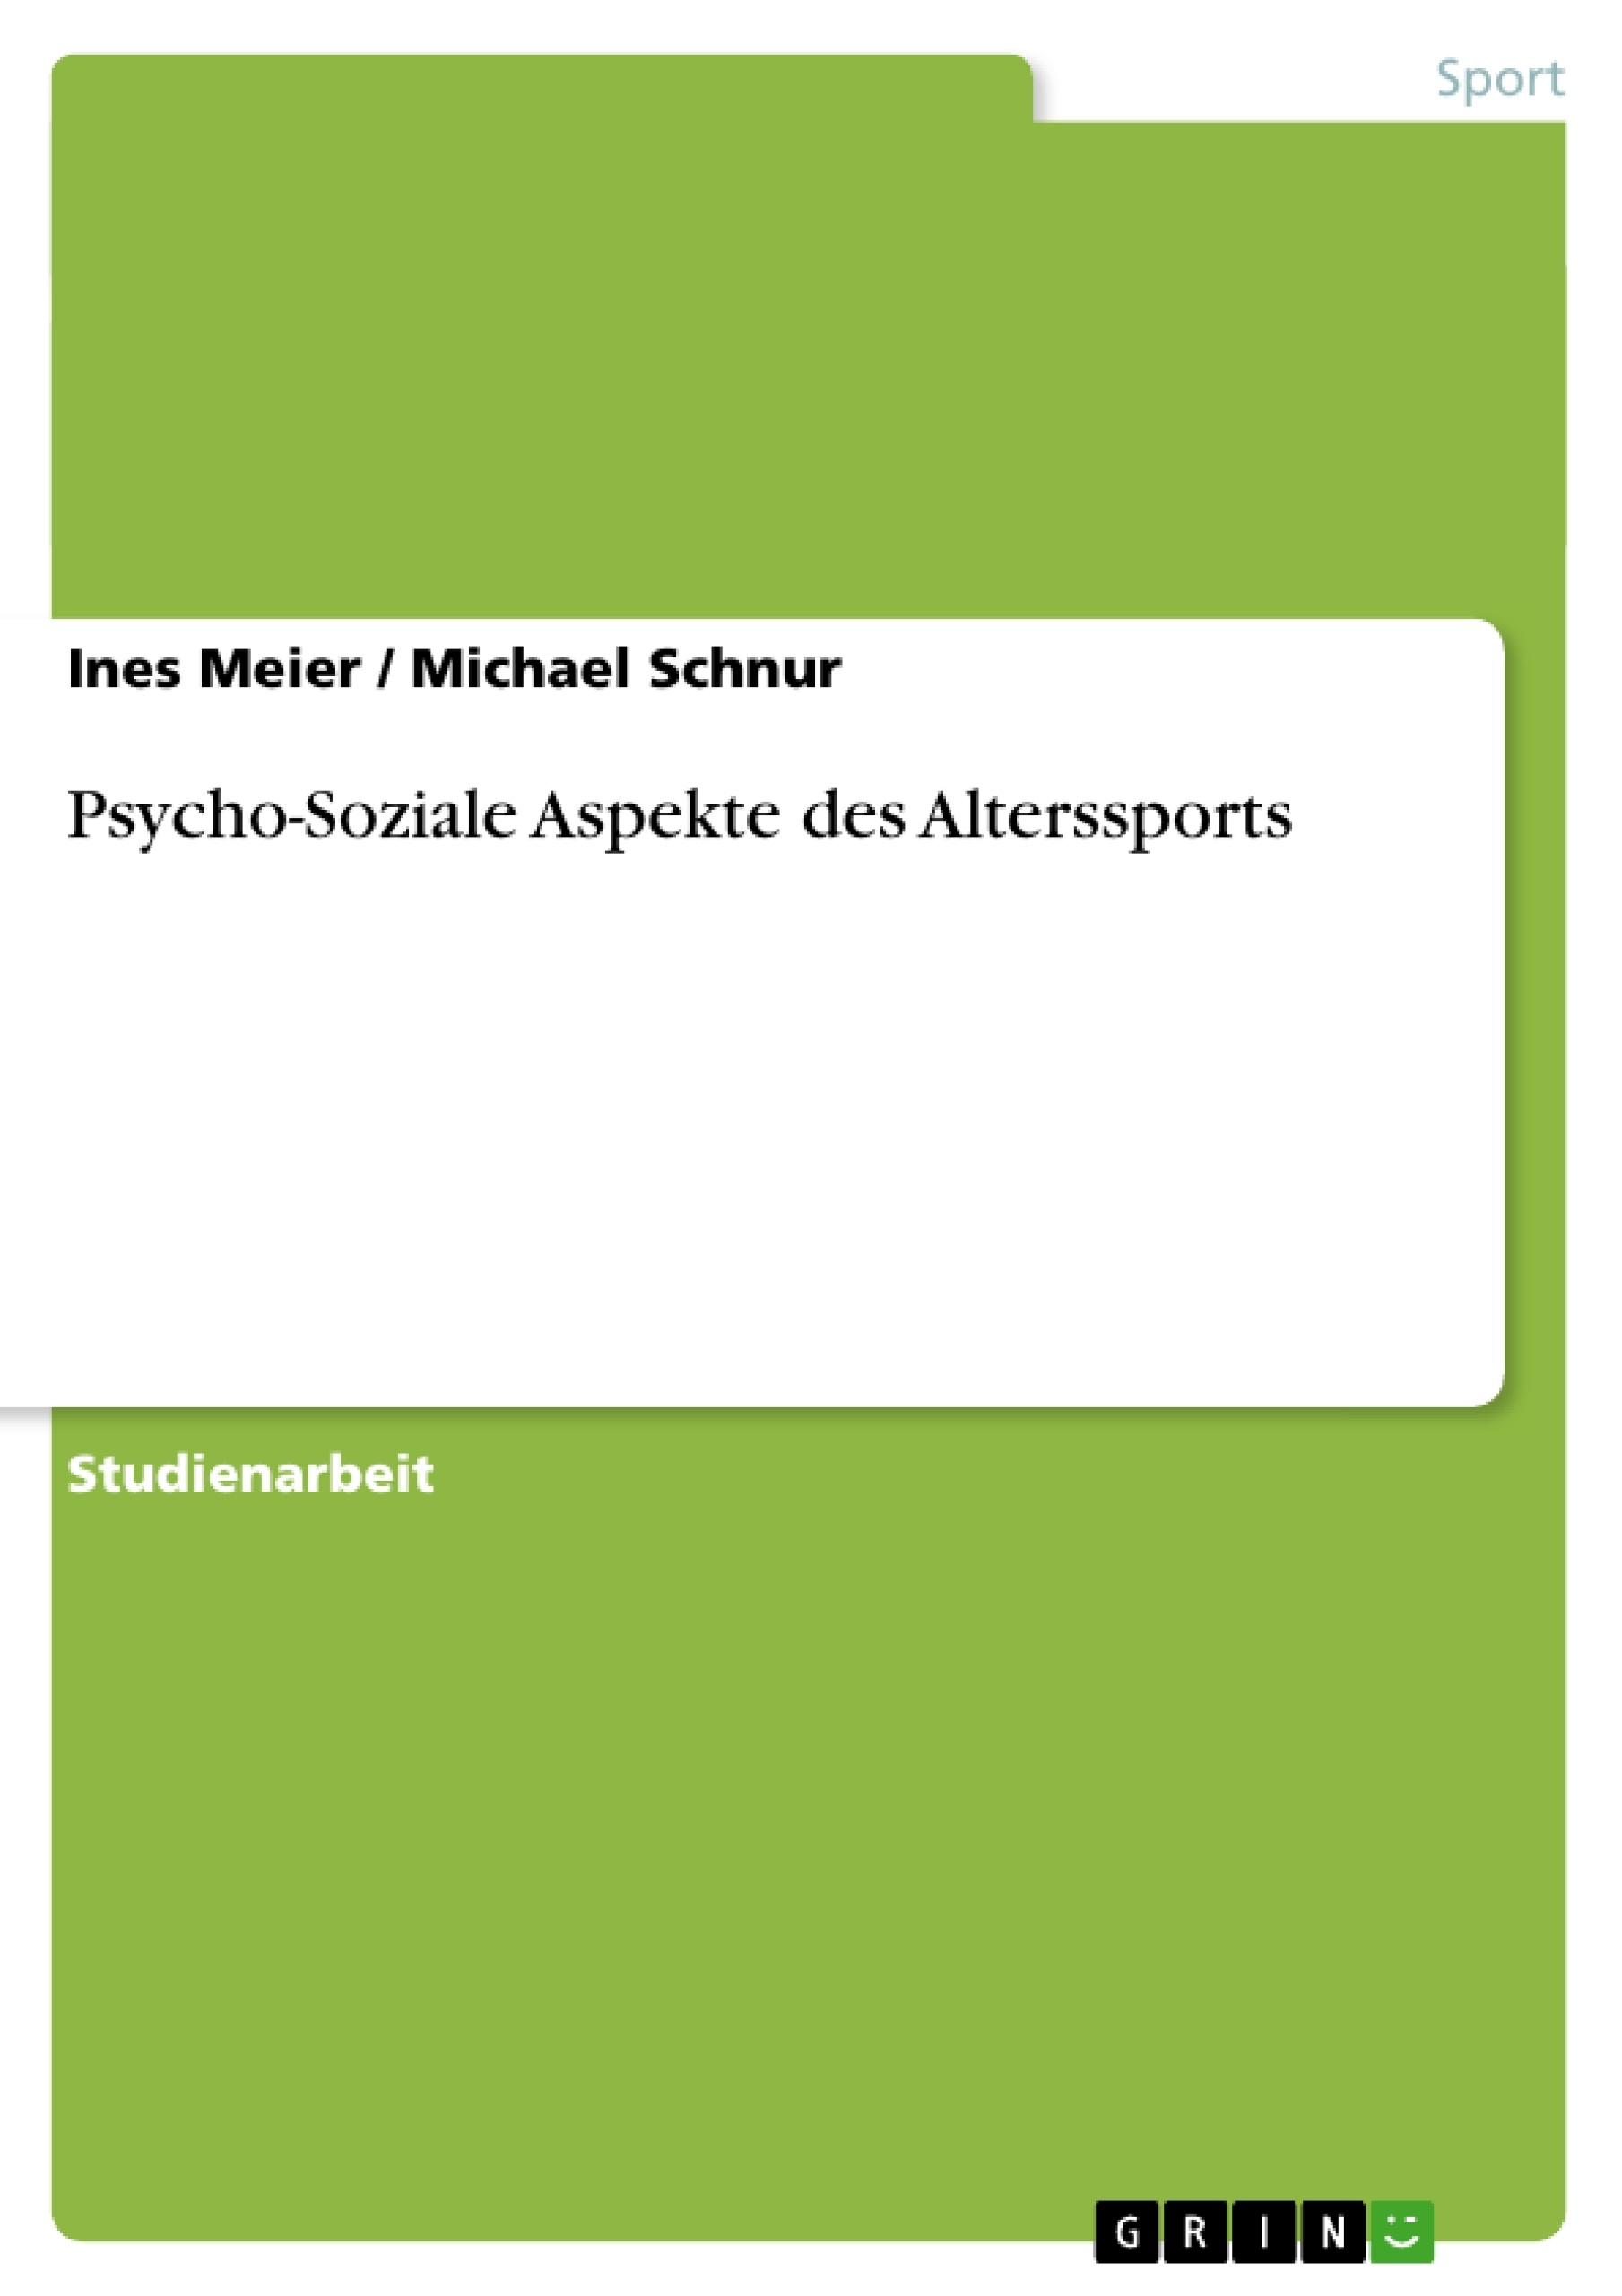 Titel: Psycho-Soziale Aspekte des Alterssports